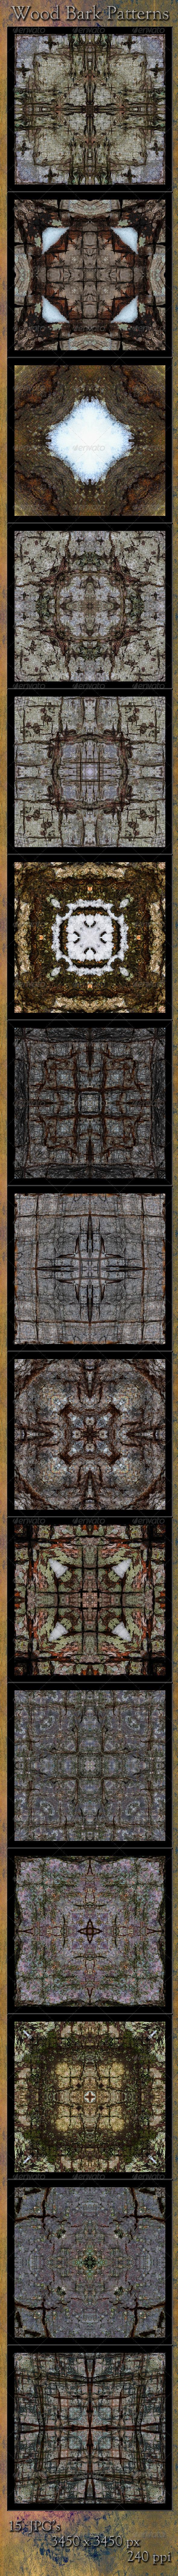 Wood Bark Pattern Textures